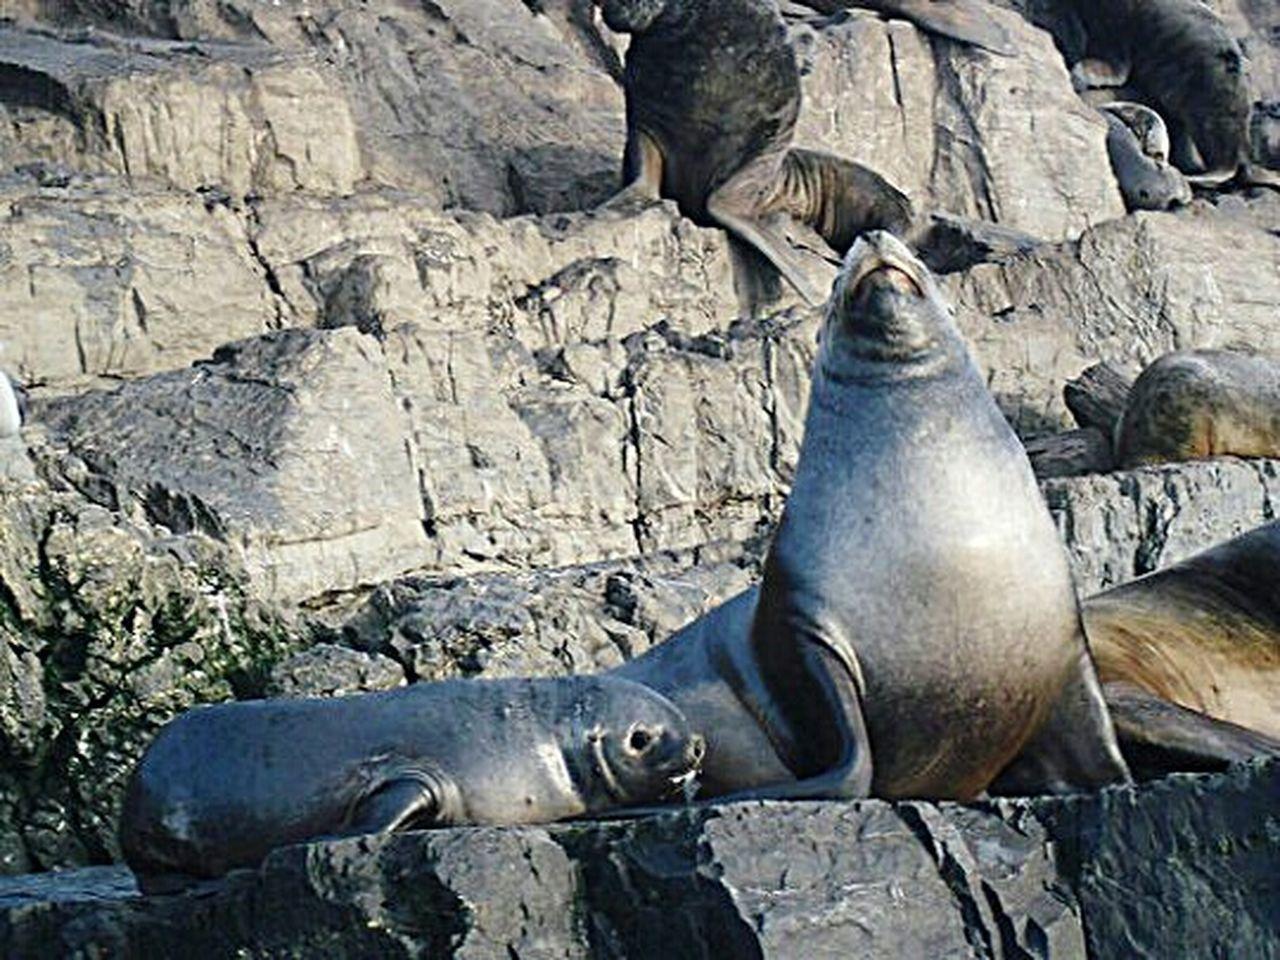 Animal Themes Animals In The Wild Animal Wildlife Aquatic Mammal Seal - Animal Sea Lion Nature Mammal Outdoors Reflection Canal Beagle Seal Travel Argentina Fin Del Mundo Ushuaïa Sea